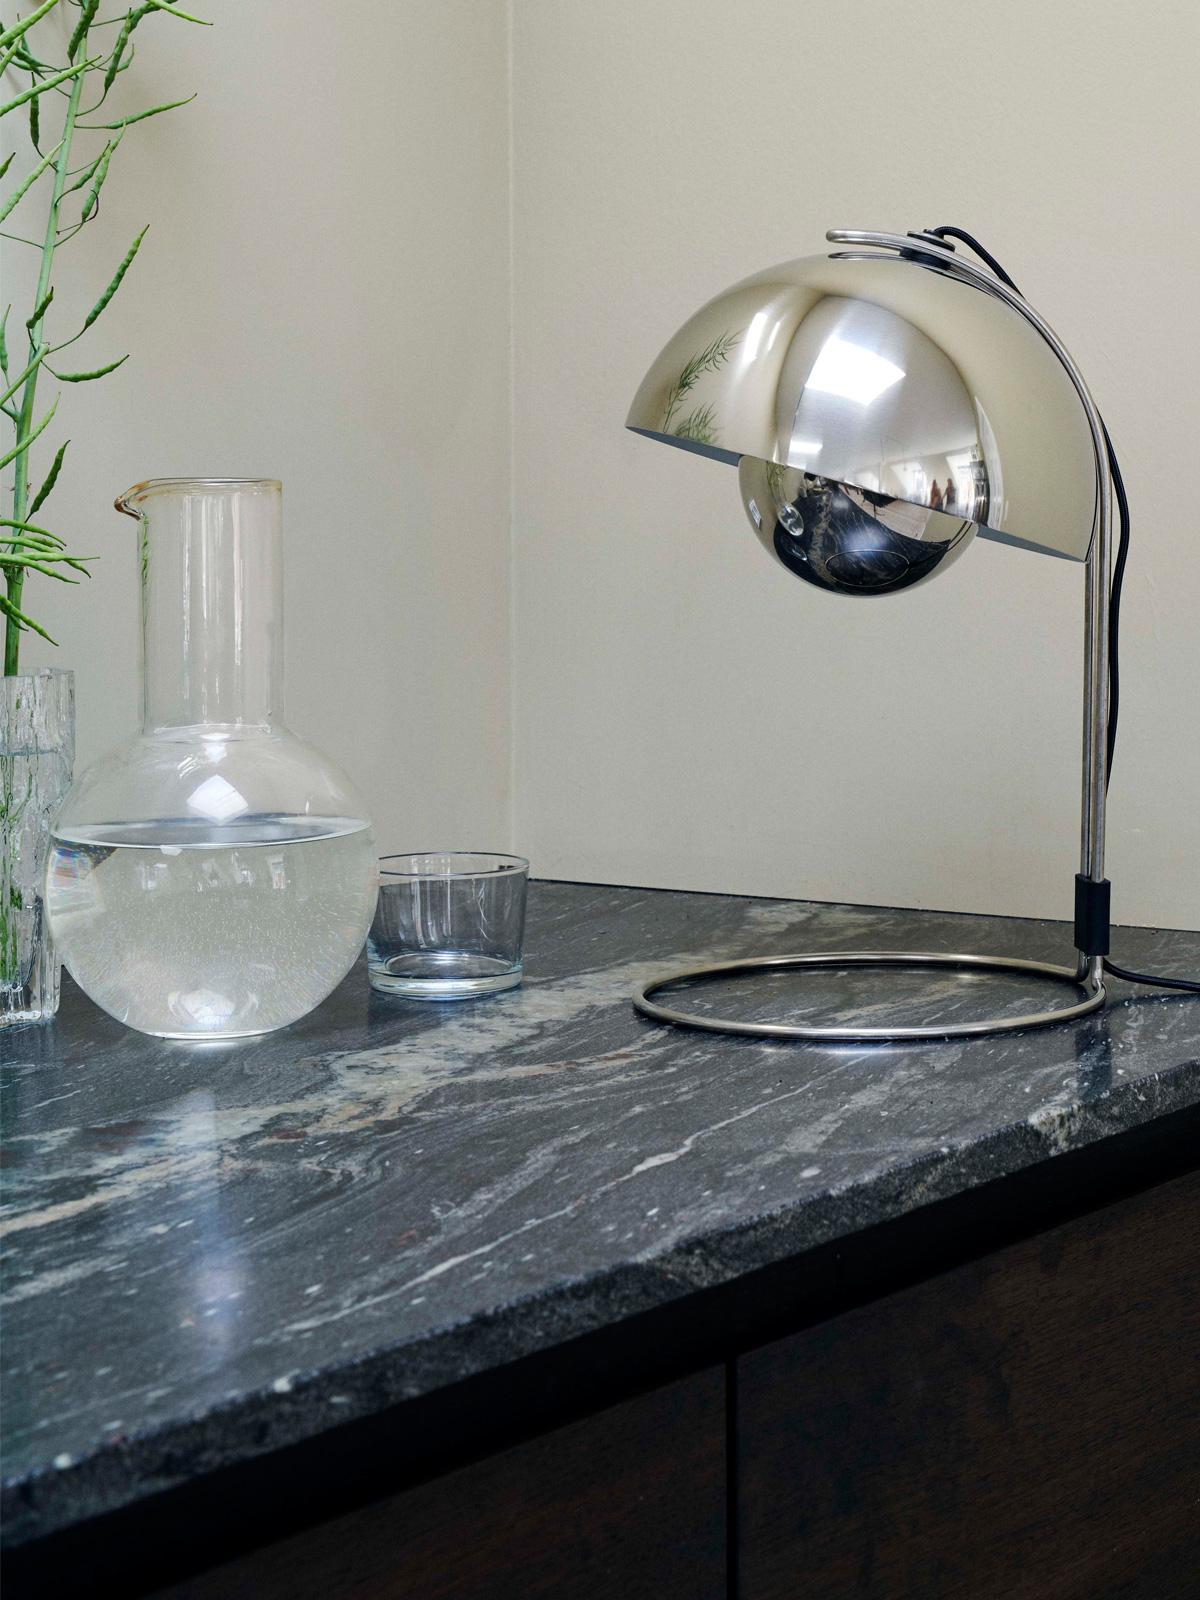 Flowerpot VP 4 &tradition Tischlampe Berlin Lampen DesignOrt